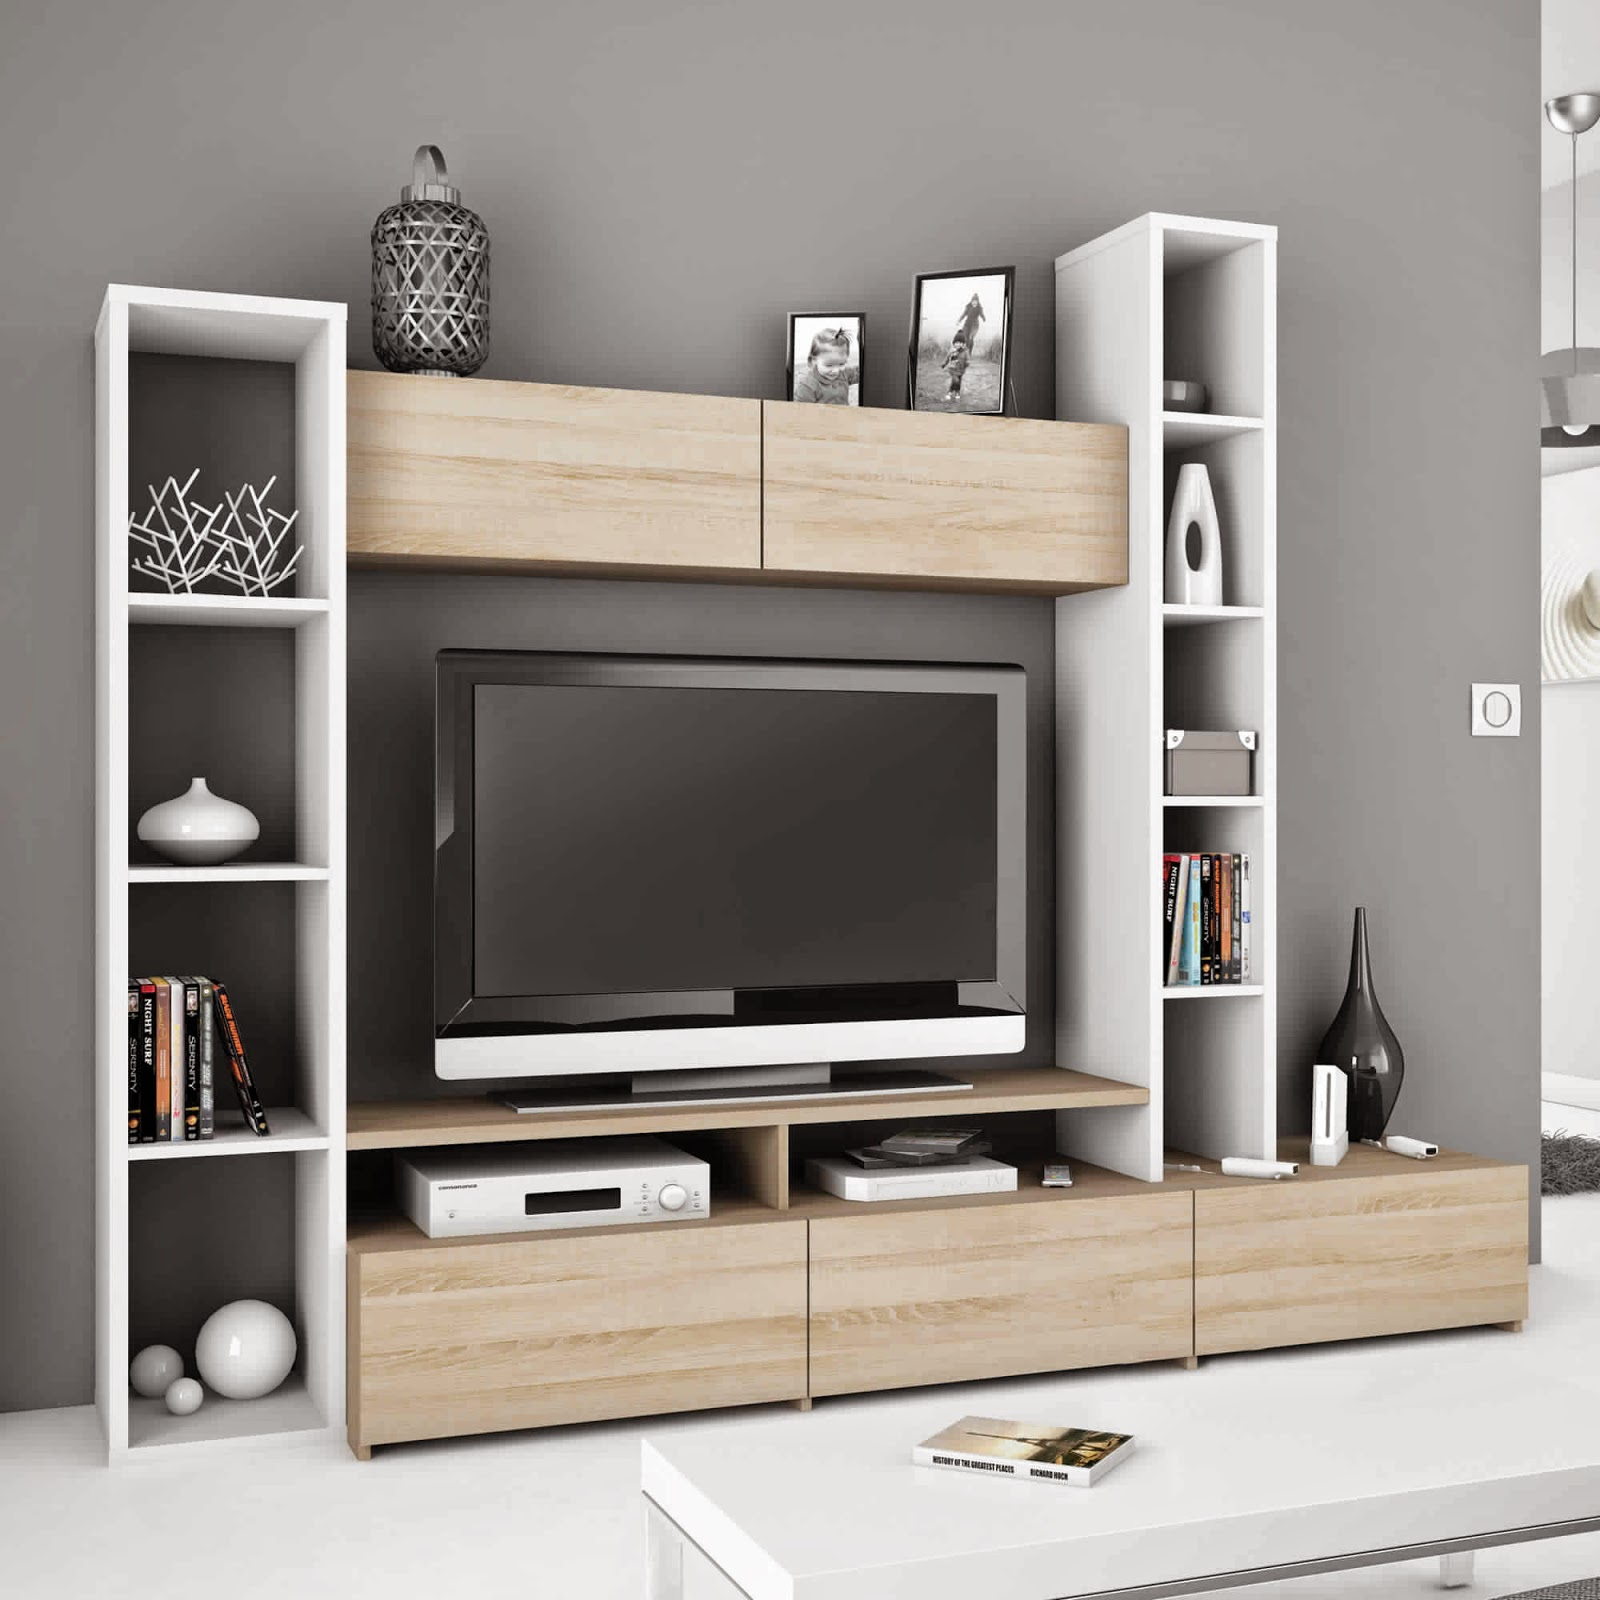 Meuble Tv Avec Rangement Pas Cher Royal Sofa Idee De Pour Meuble Tv Avec Enceinte Integre Conforama Agencecormierdelauniere Com Agencecormierdelauniere Com